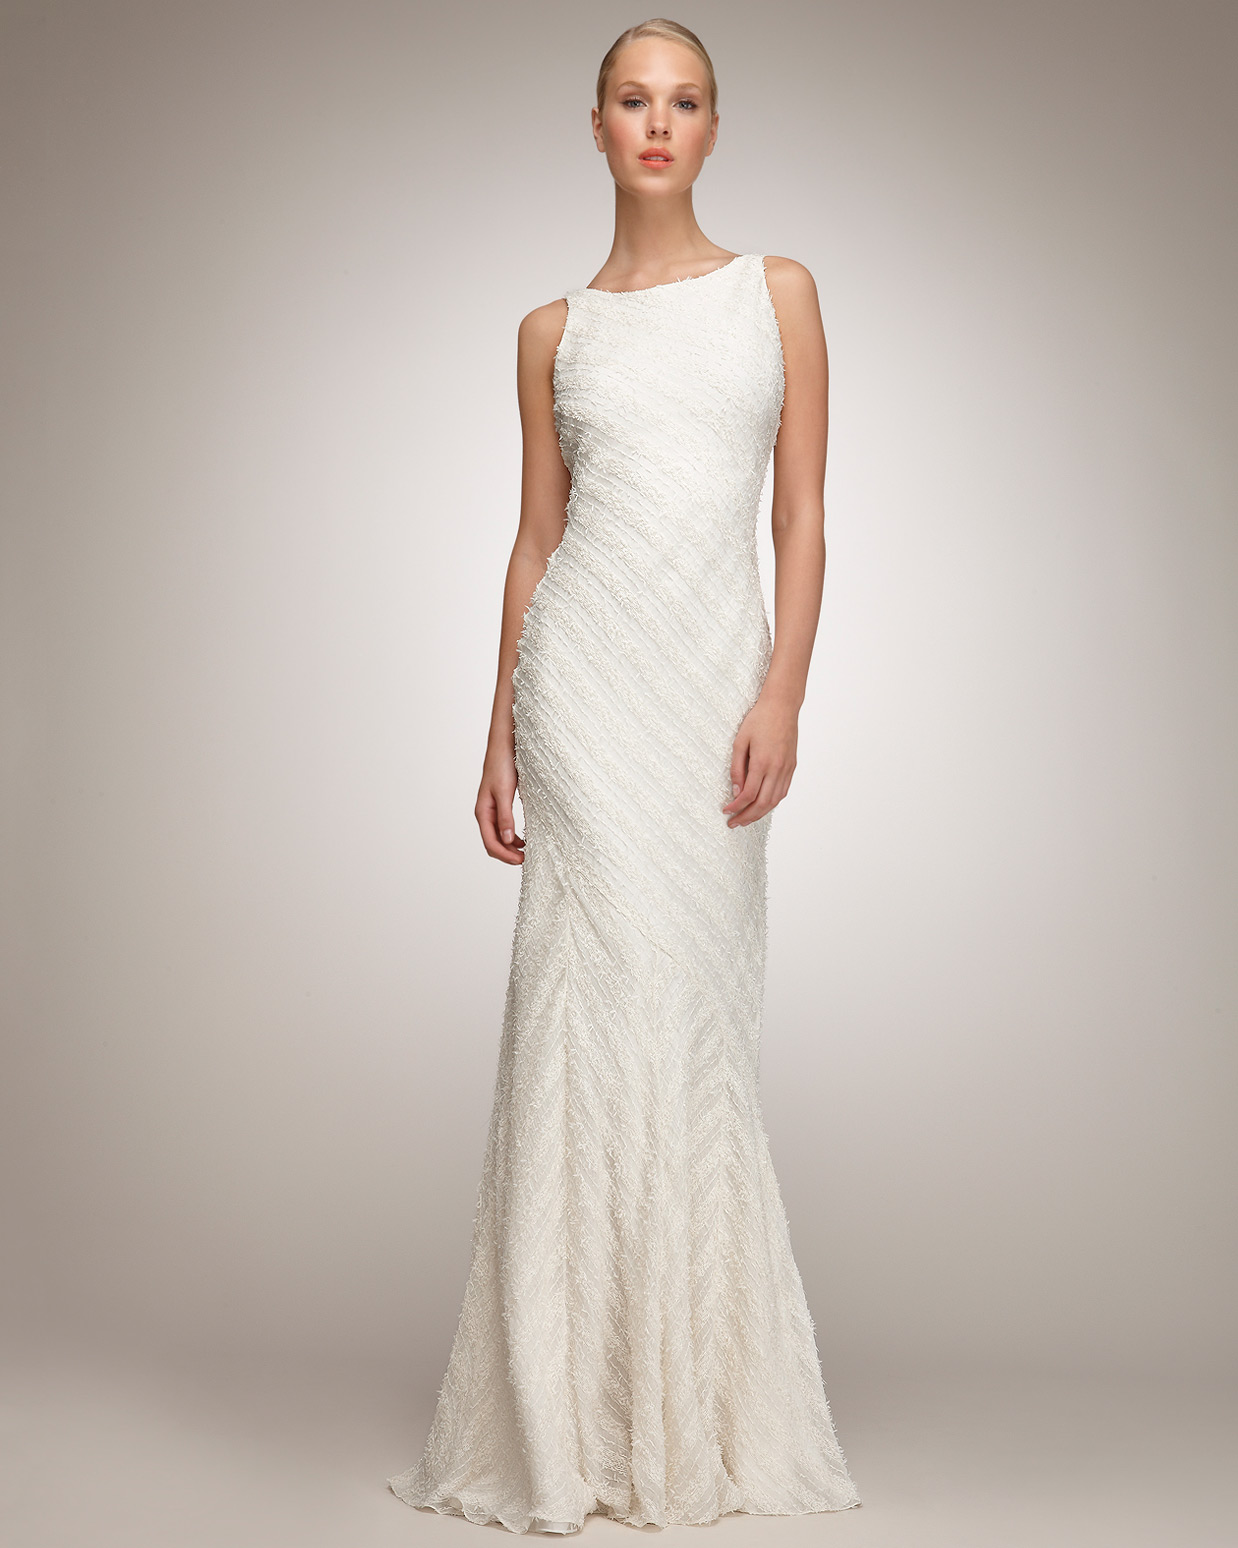 issac-mizrahi-gowns-0611wd5.jpg